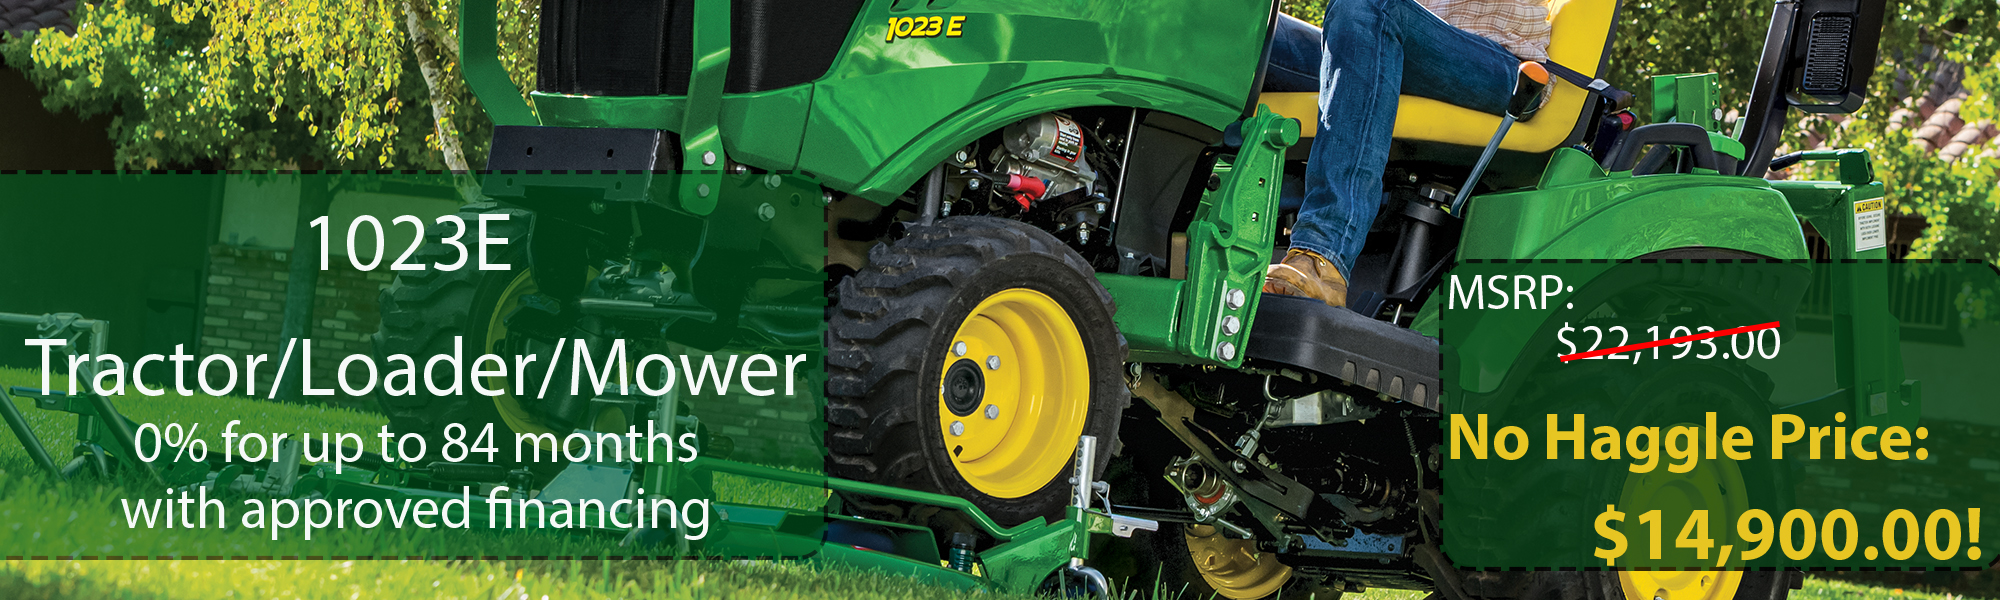 John Deere Equipment Dealer | Sub-Compact Tractors | Compact Utility